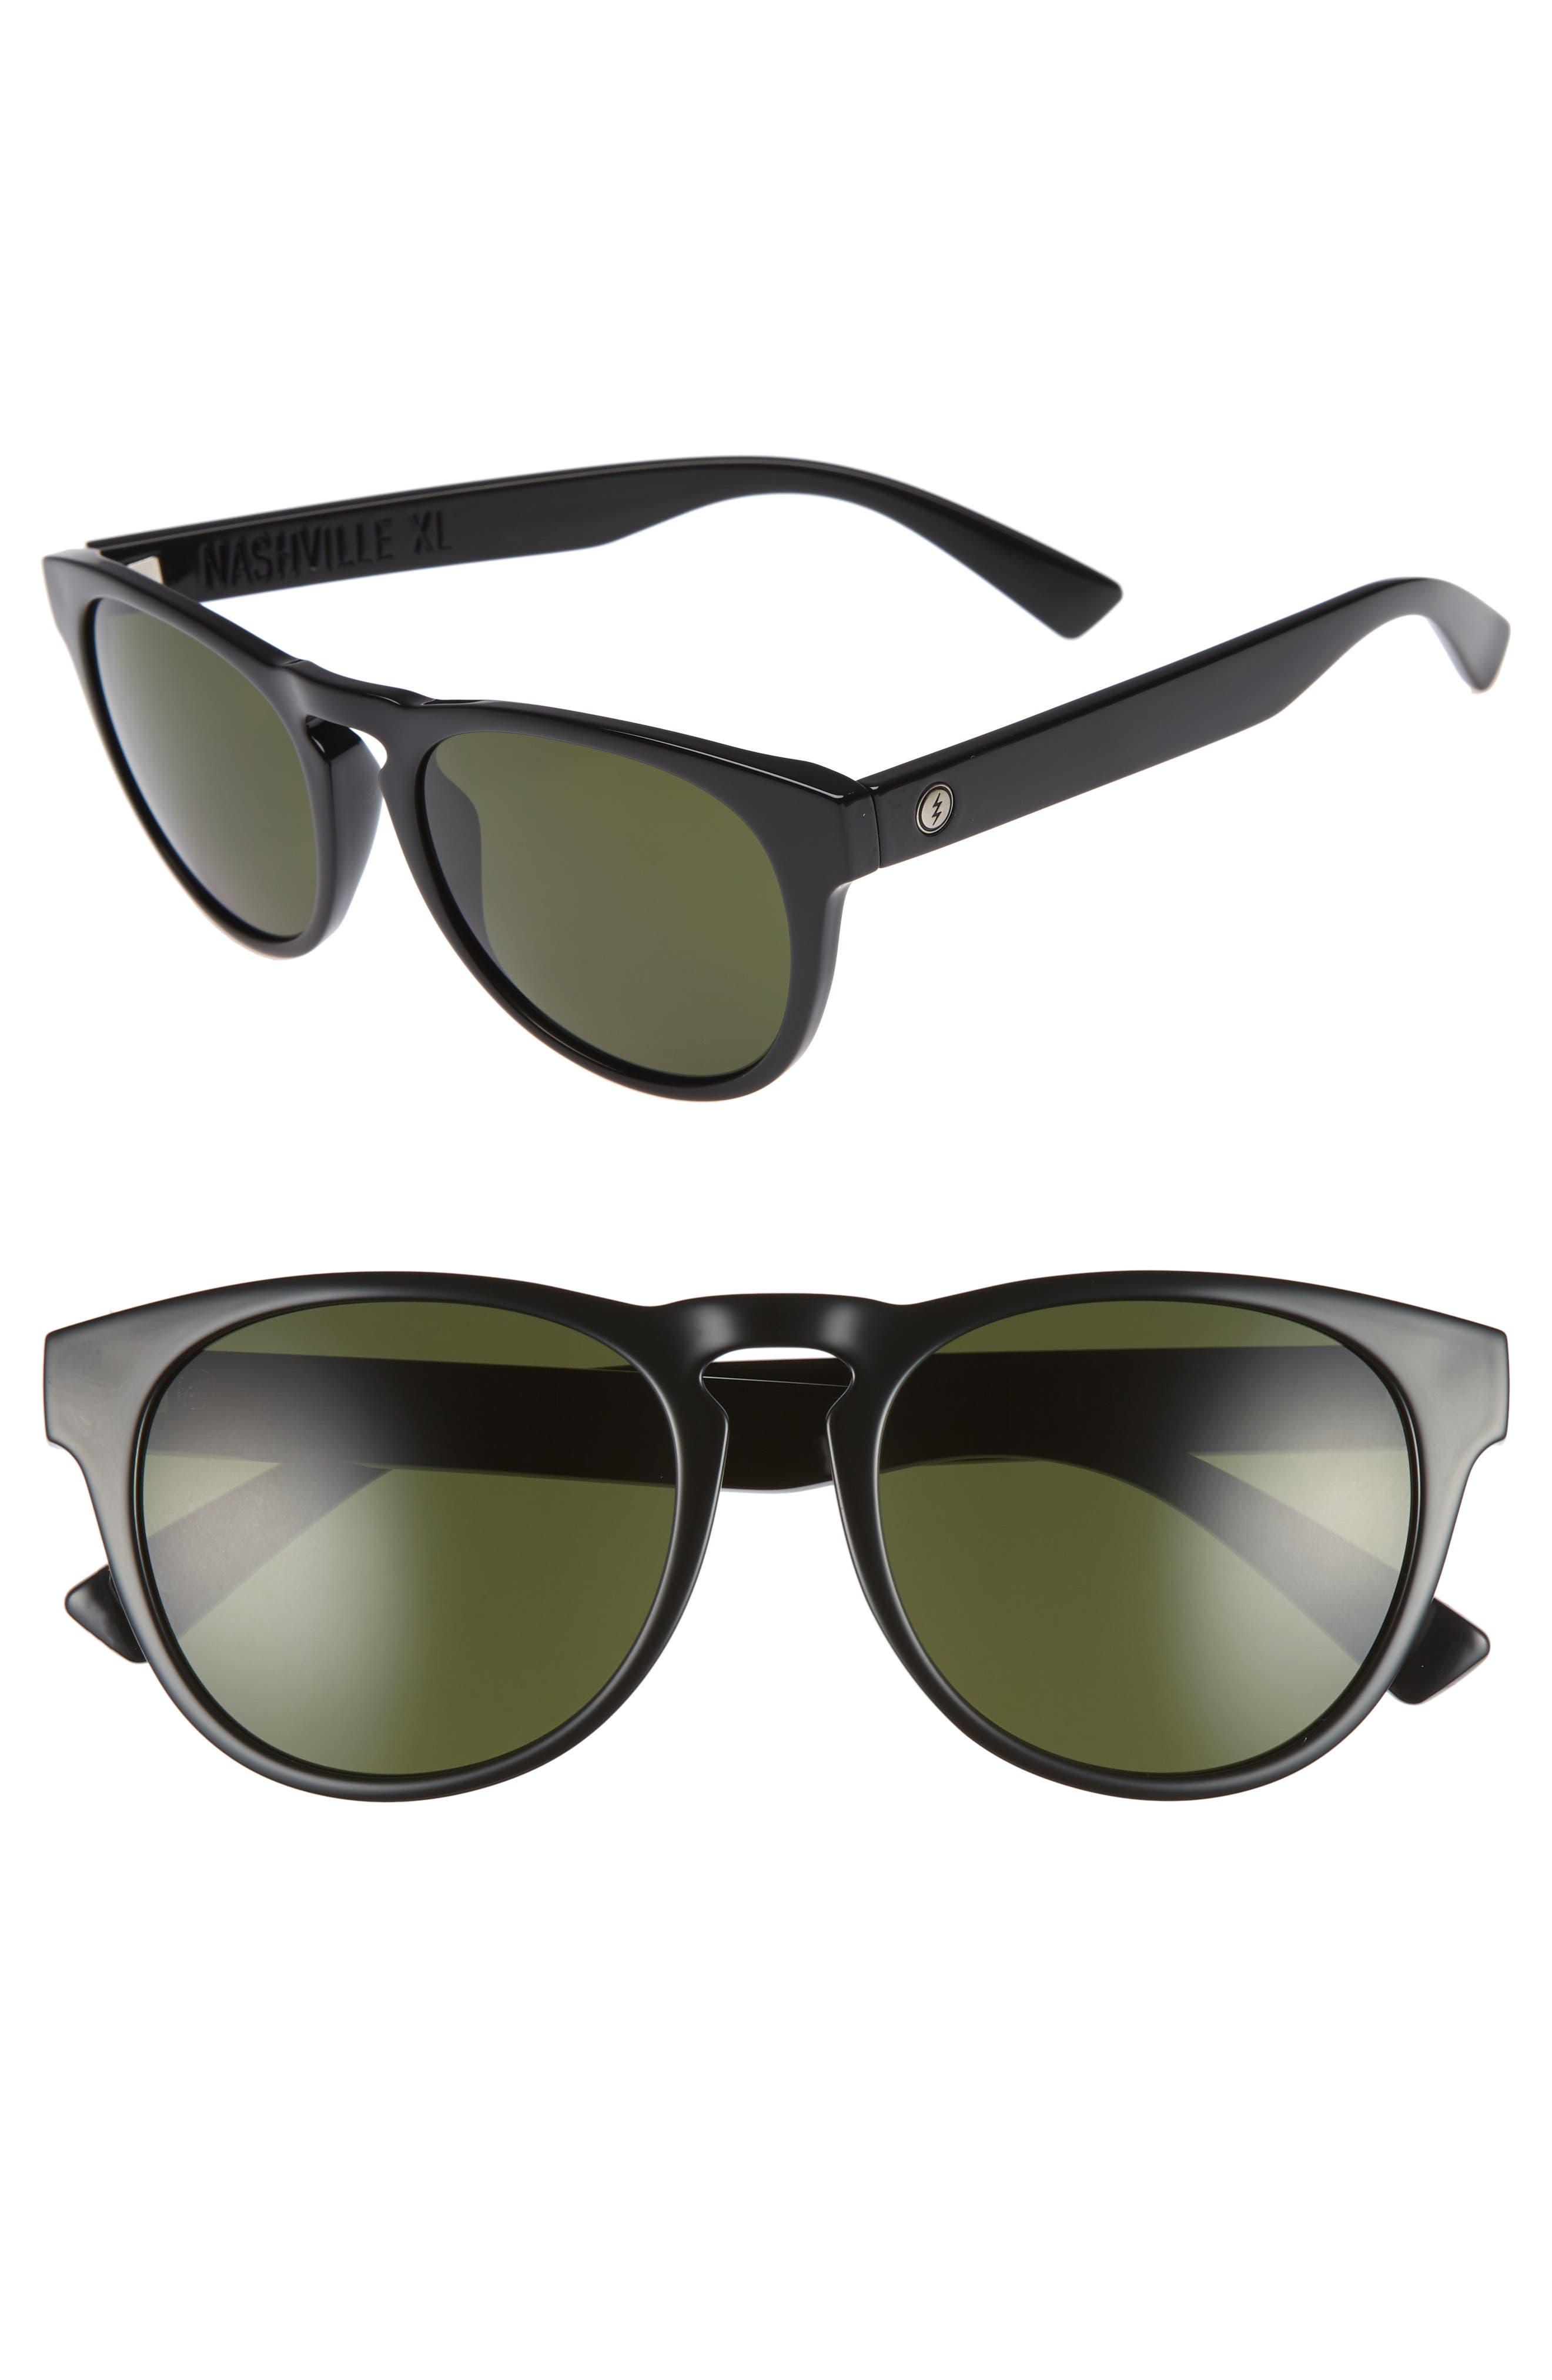 Main Image - ELECTRIC Nashville XL 52mm Melanin Infused Sunglasses